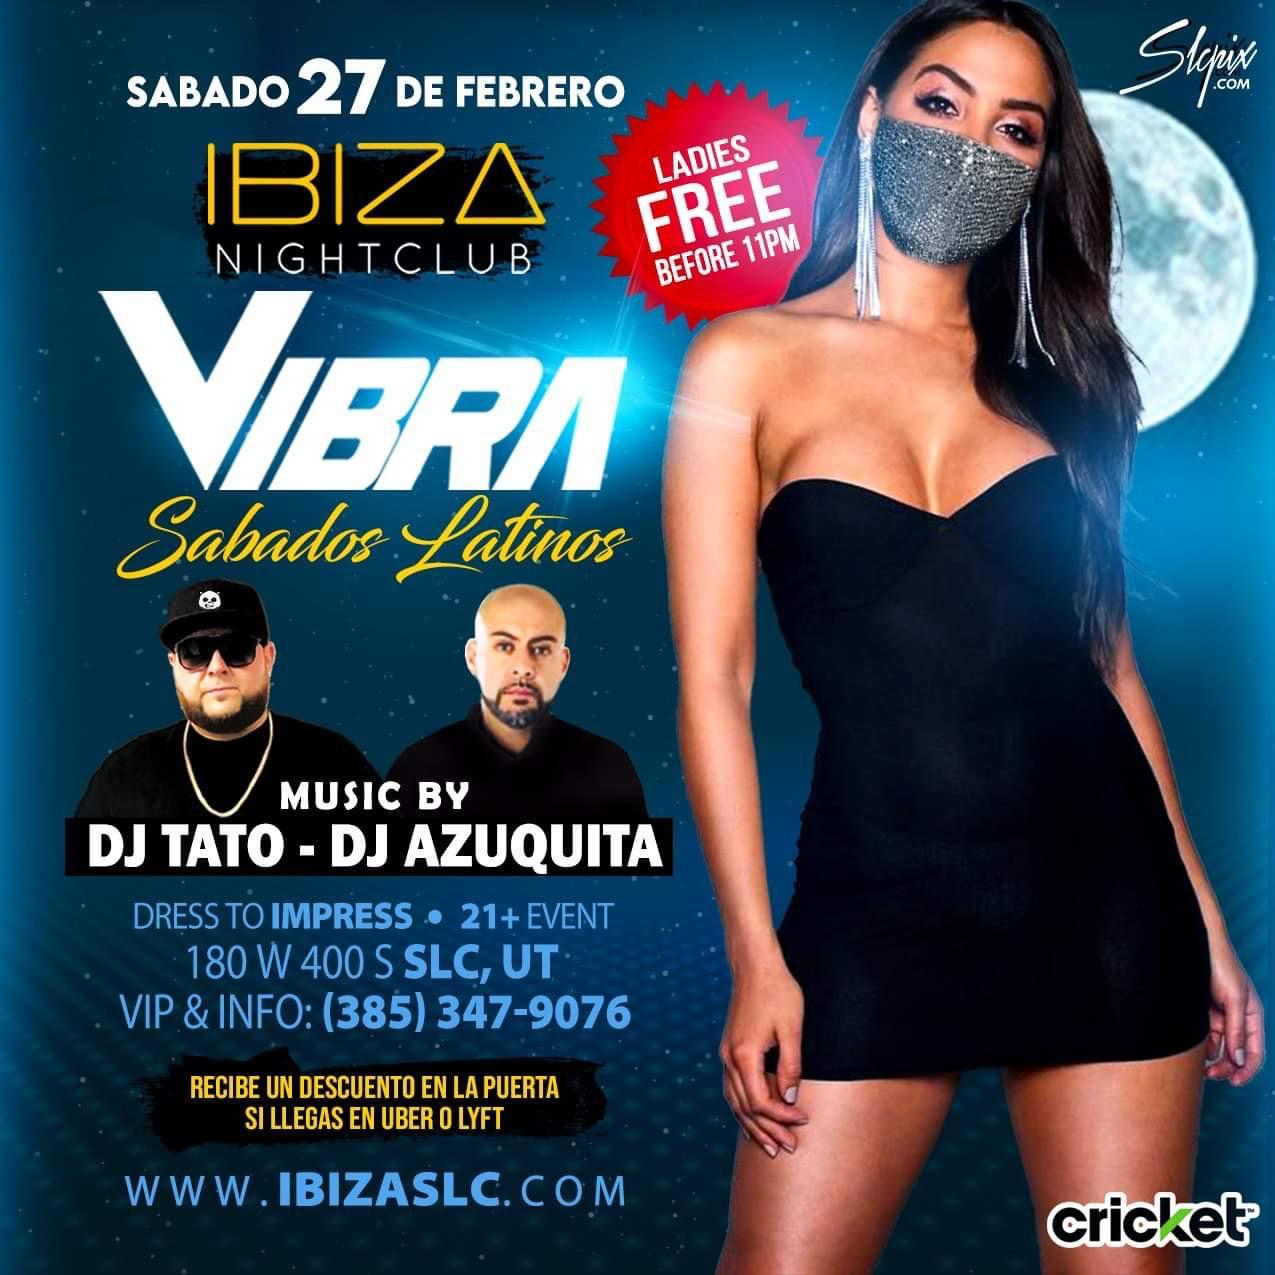 Vibra Sabados Latinos 2-27-21